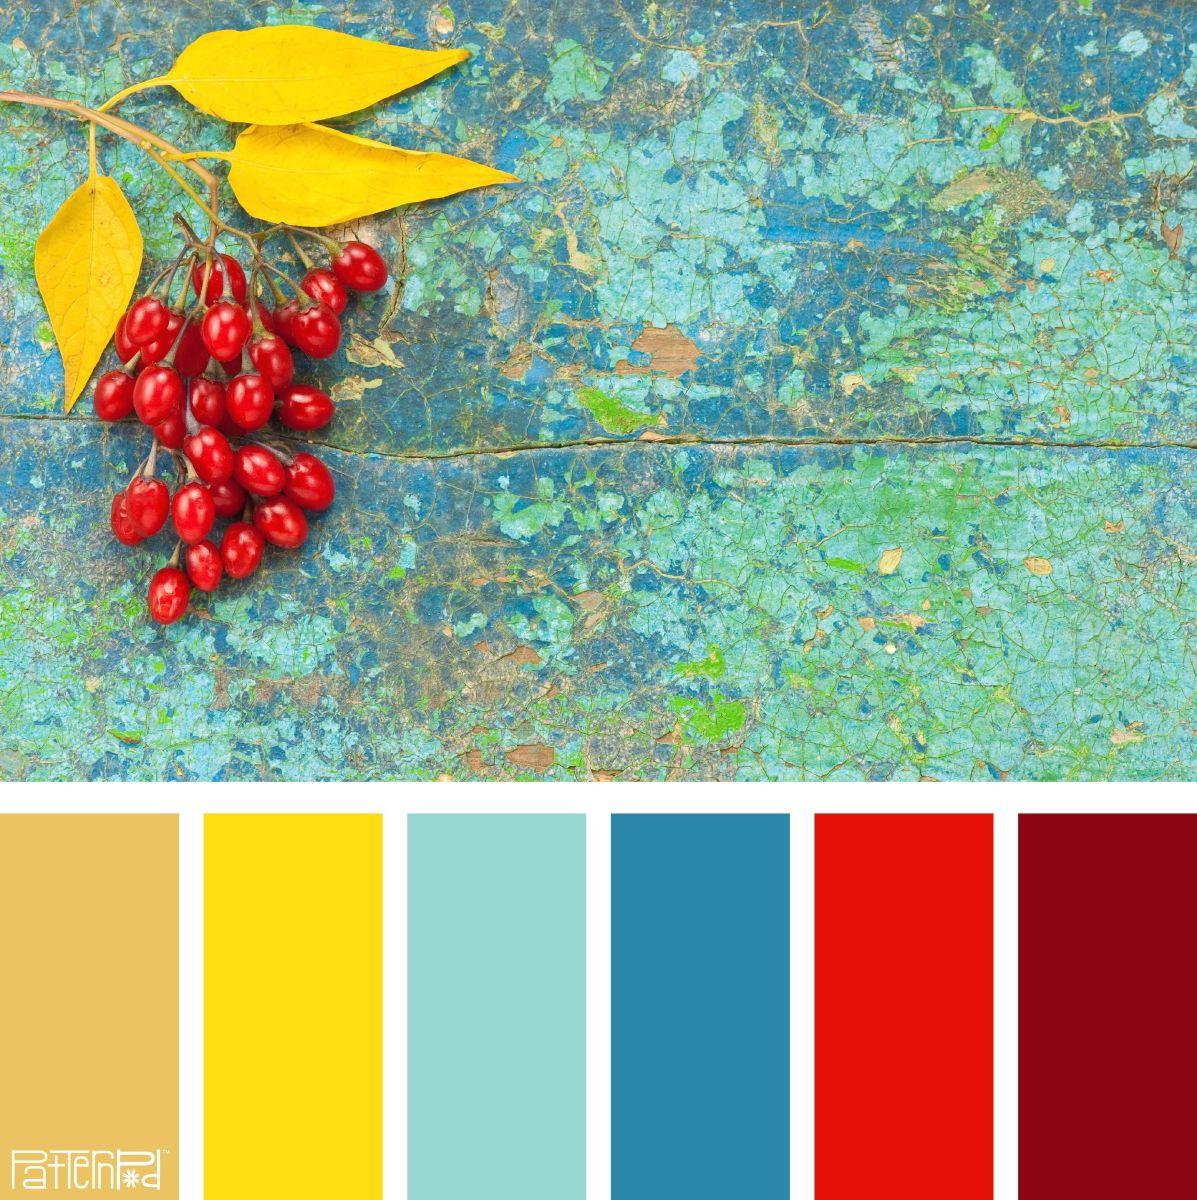 A Triadic Color Scheme Example